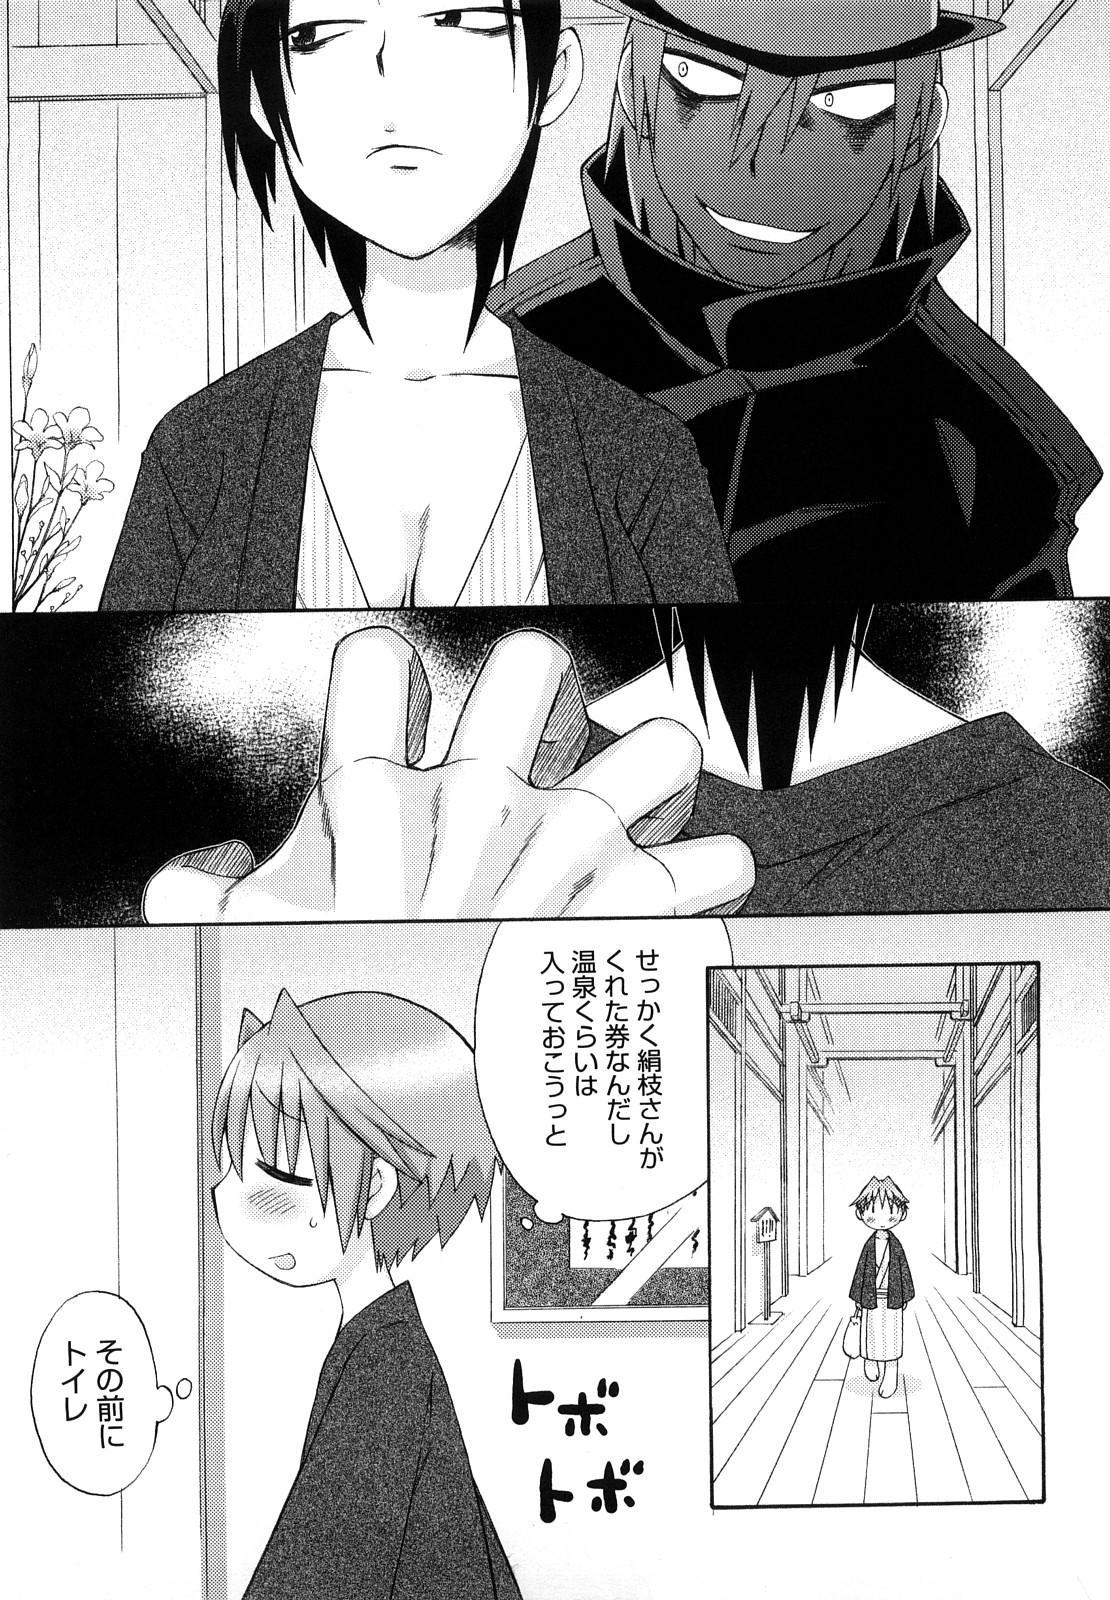 Hatsuden Pandakun! Shinsouban 133